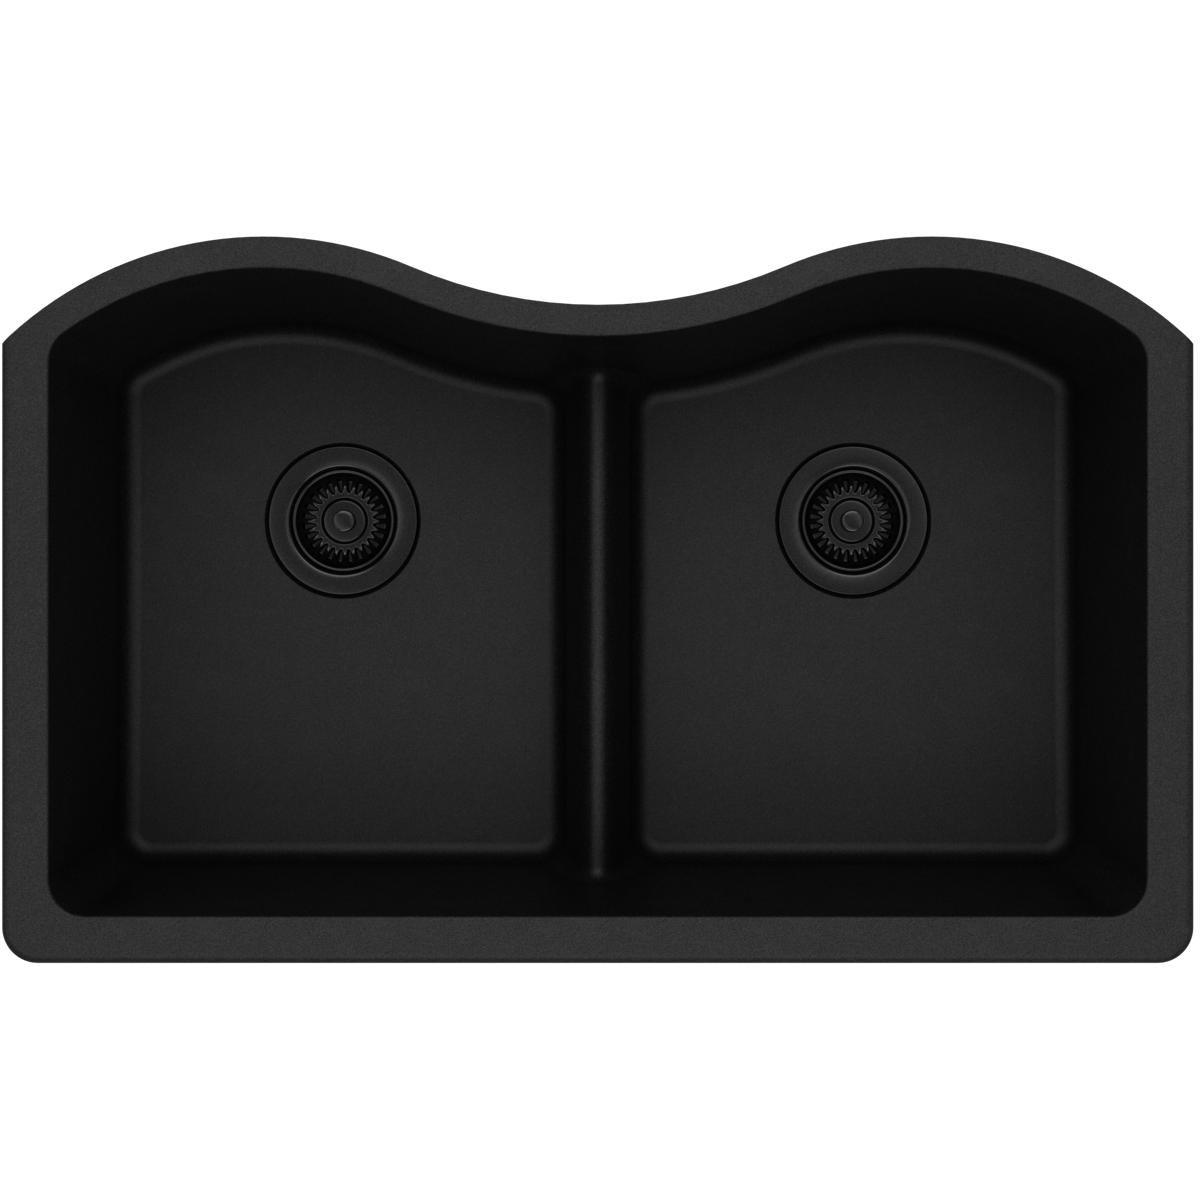 Elkay ELGULB3322BK0 Quartz Classic Equal Double Bowl Undermount Sink with Aqua Divide, Black